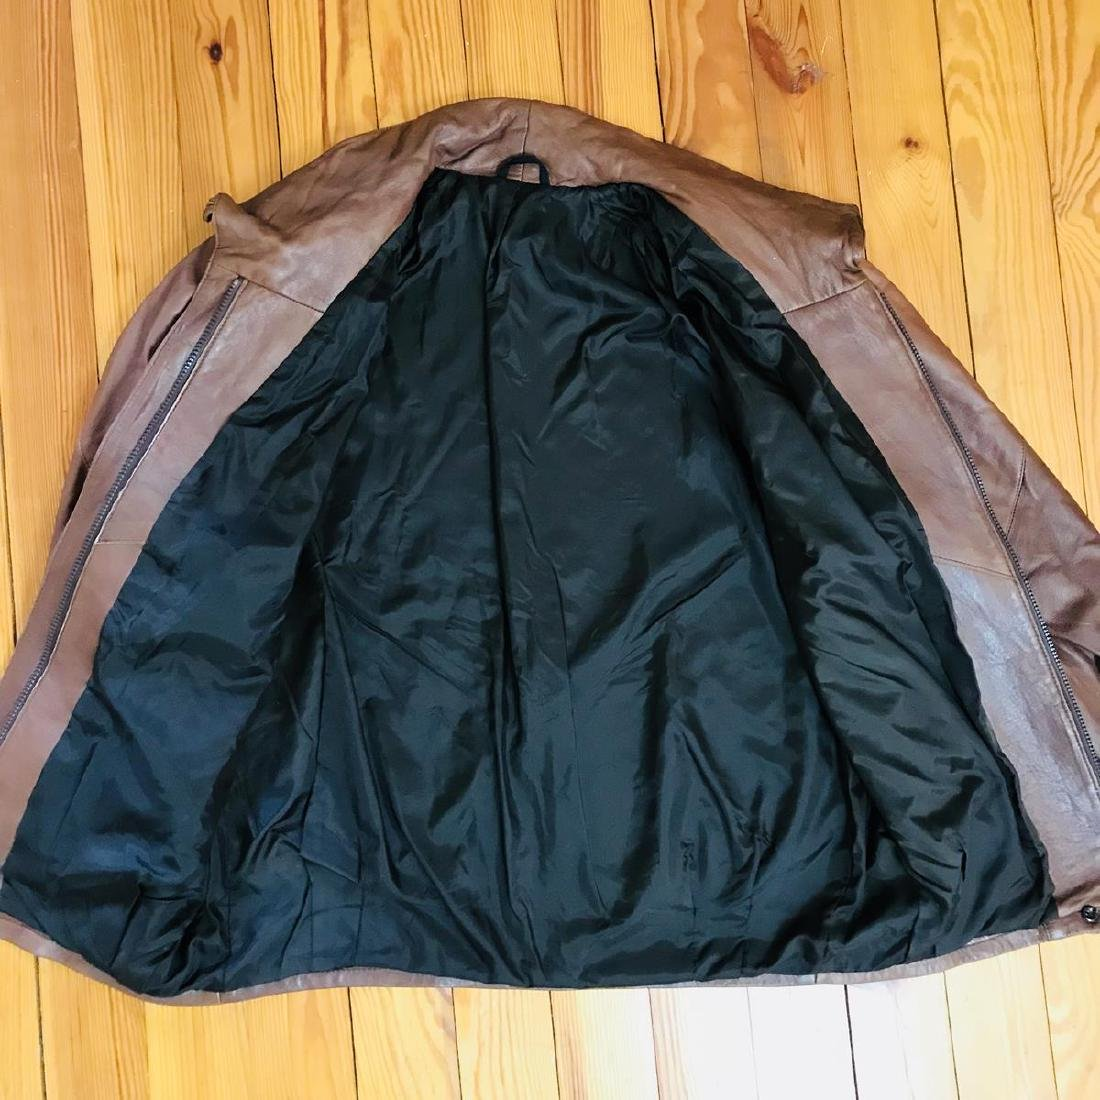 Vintage Women's Leather Jacket Coat - 6